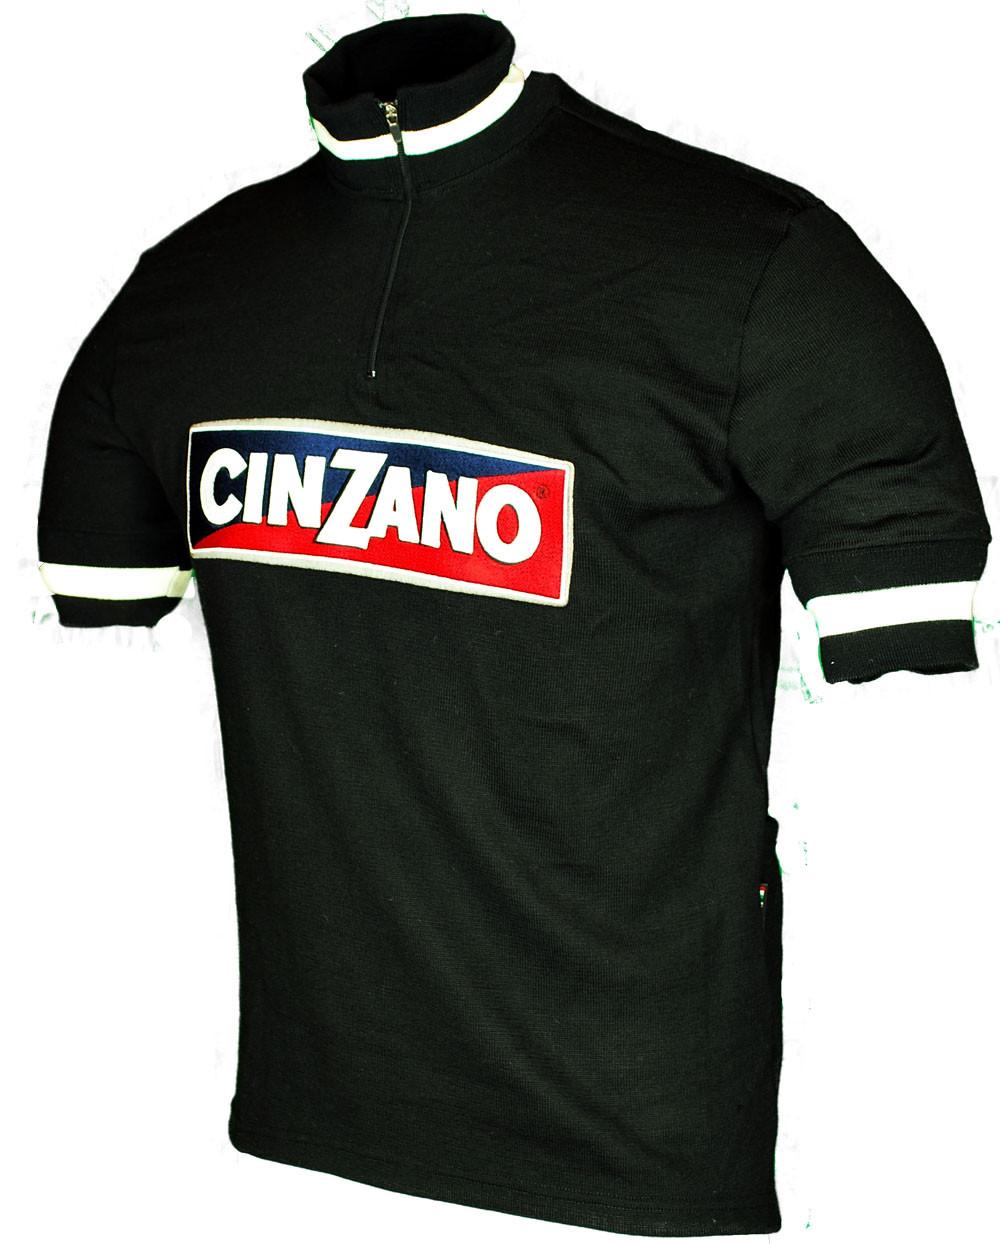 Cinzano Wool Black Retro Jersey Side